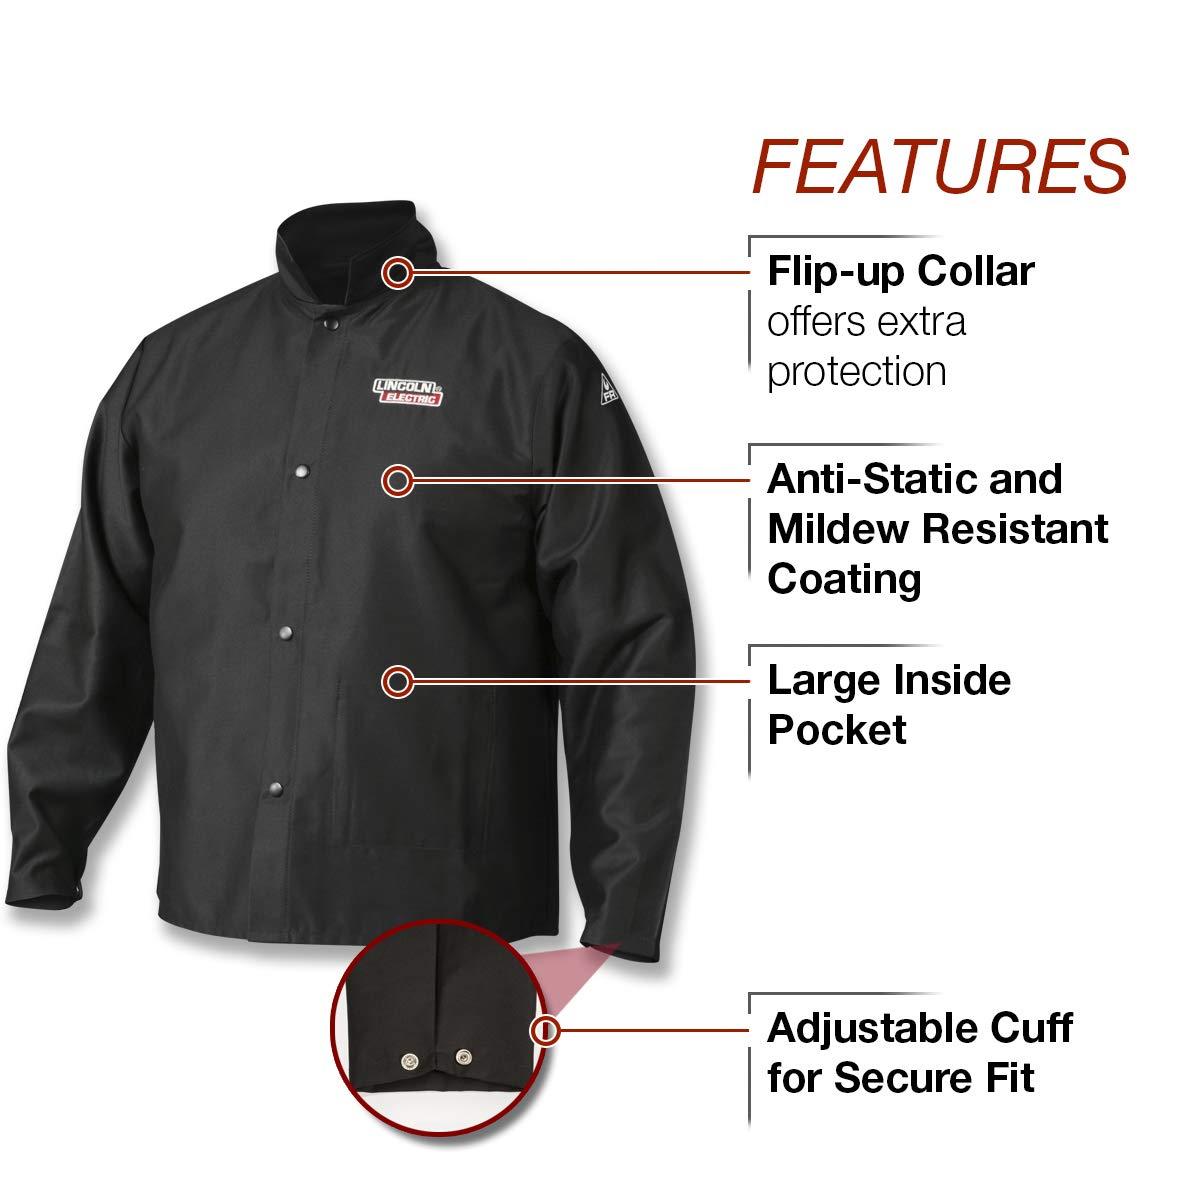 Lincoln Electric  Premium Flame Resistant (FR) Cotton Welding Jacket | Comfortable | Black | XXXL | K2985-XXXL by Lincoln Electric (Image #3)